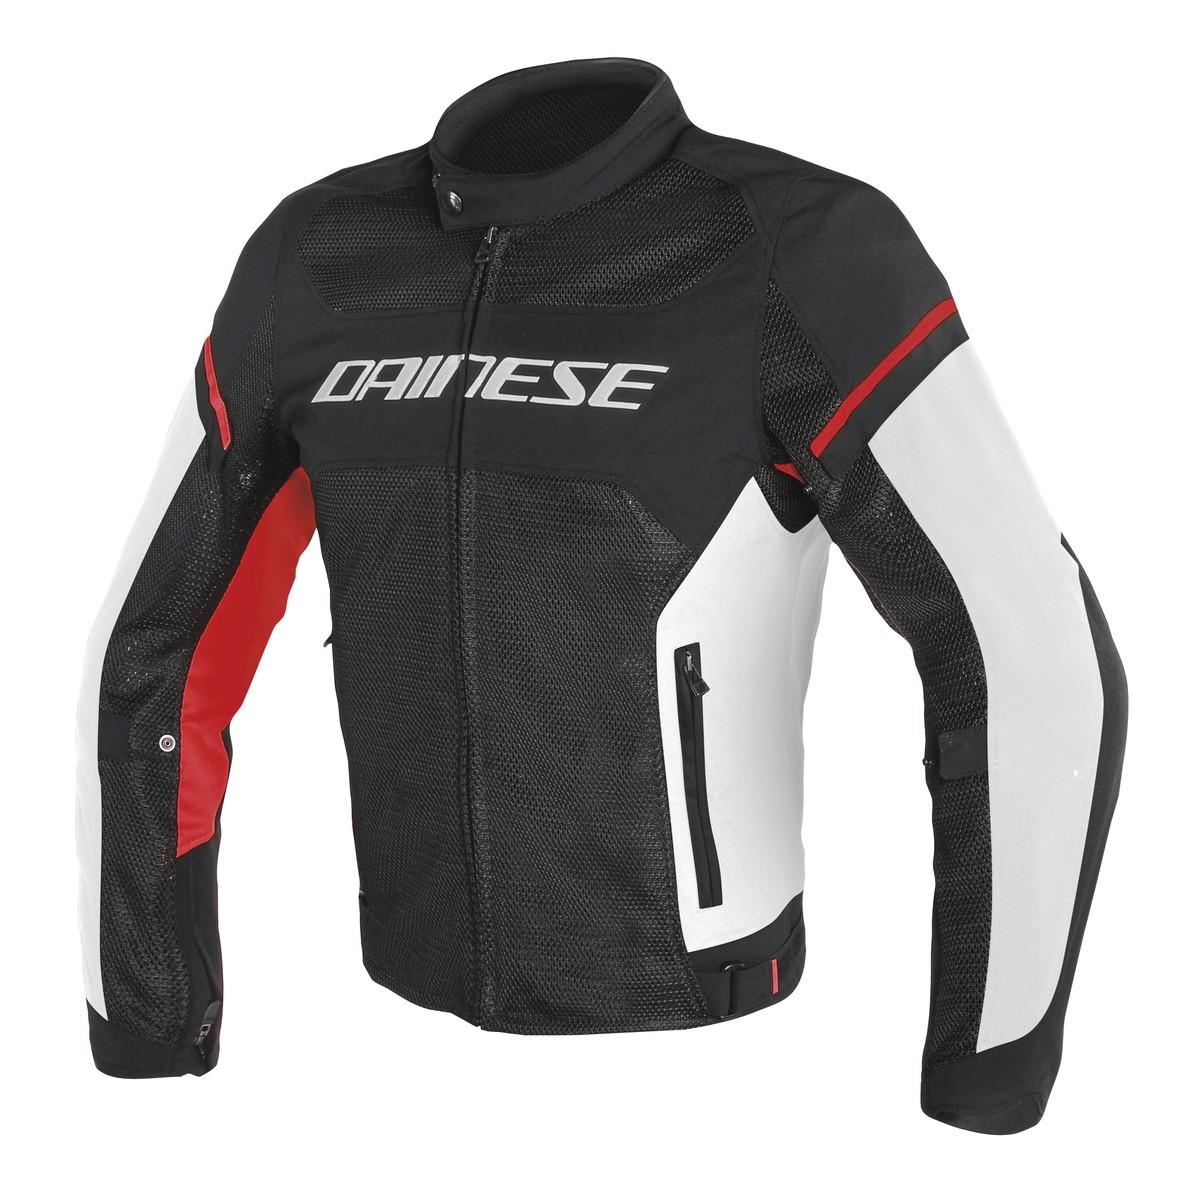 4d01e113 Chaqueta Dainese Air Frame D1 tex negro/blanco/rojo, compra online